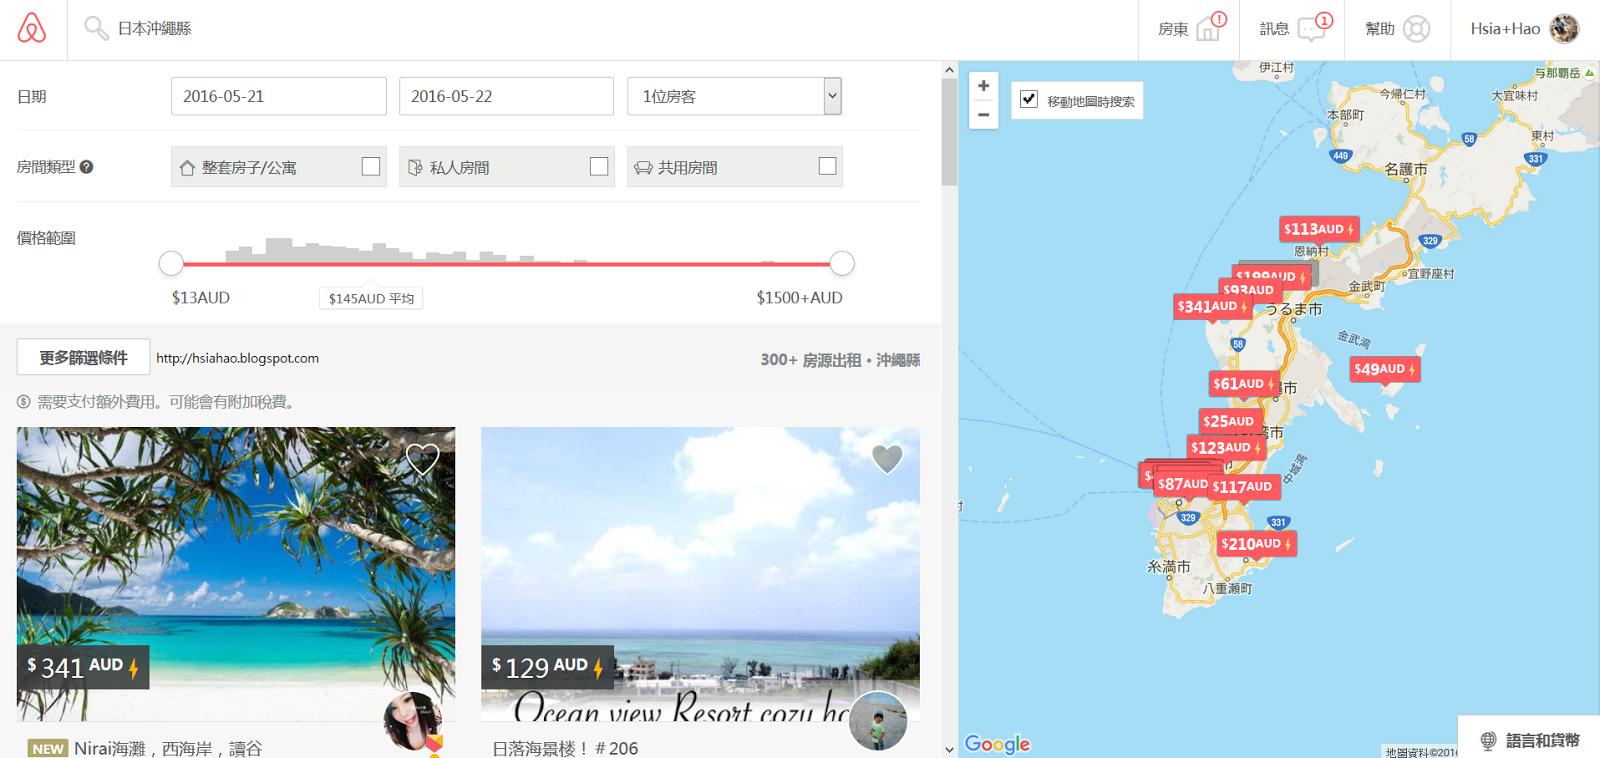 airbnb-住宿-訂房網站-比價平台-推薦-自由行-旅遊-booking-agoda-hotels-expedia